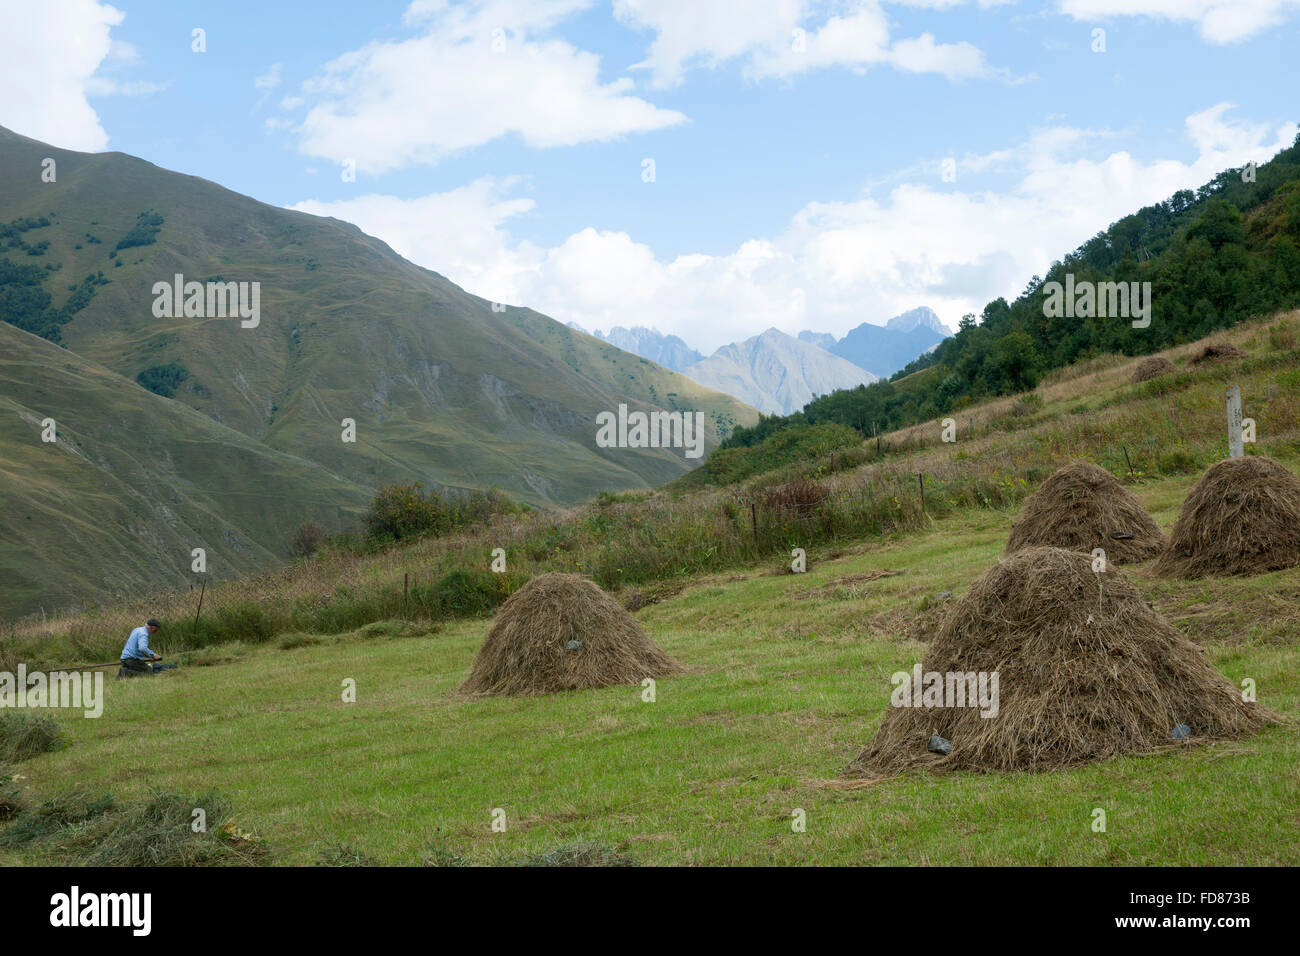 Georgien, Mtskheta-Mtianeti, im Sno-Tal südlich von Stepansminda. - Stock Image